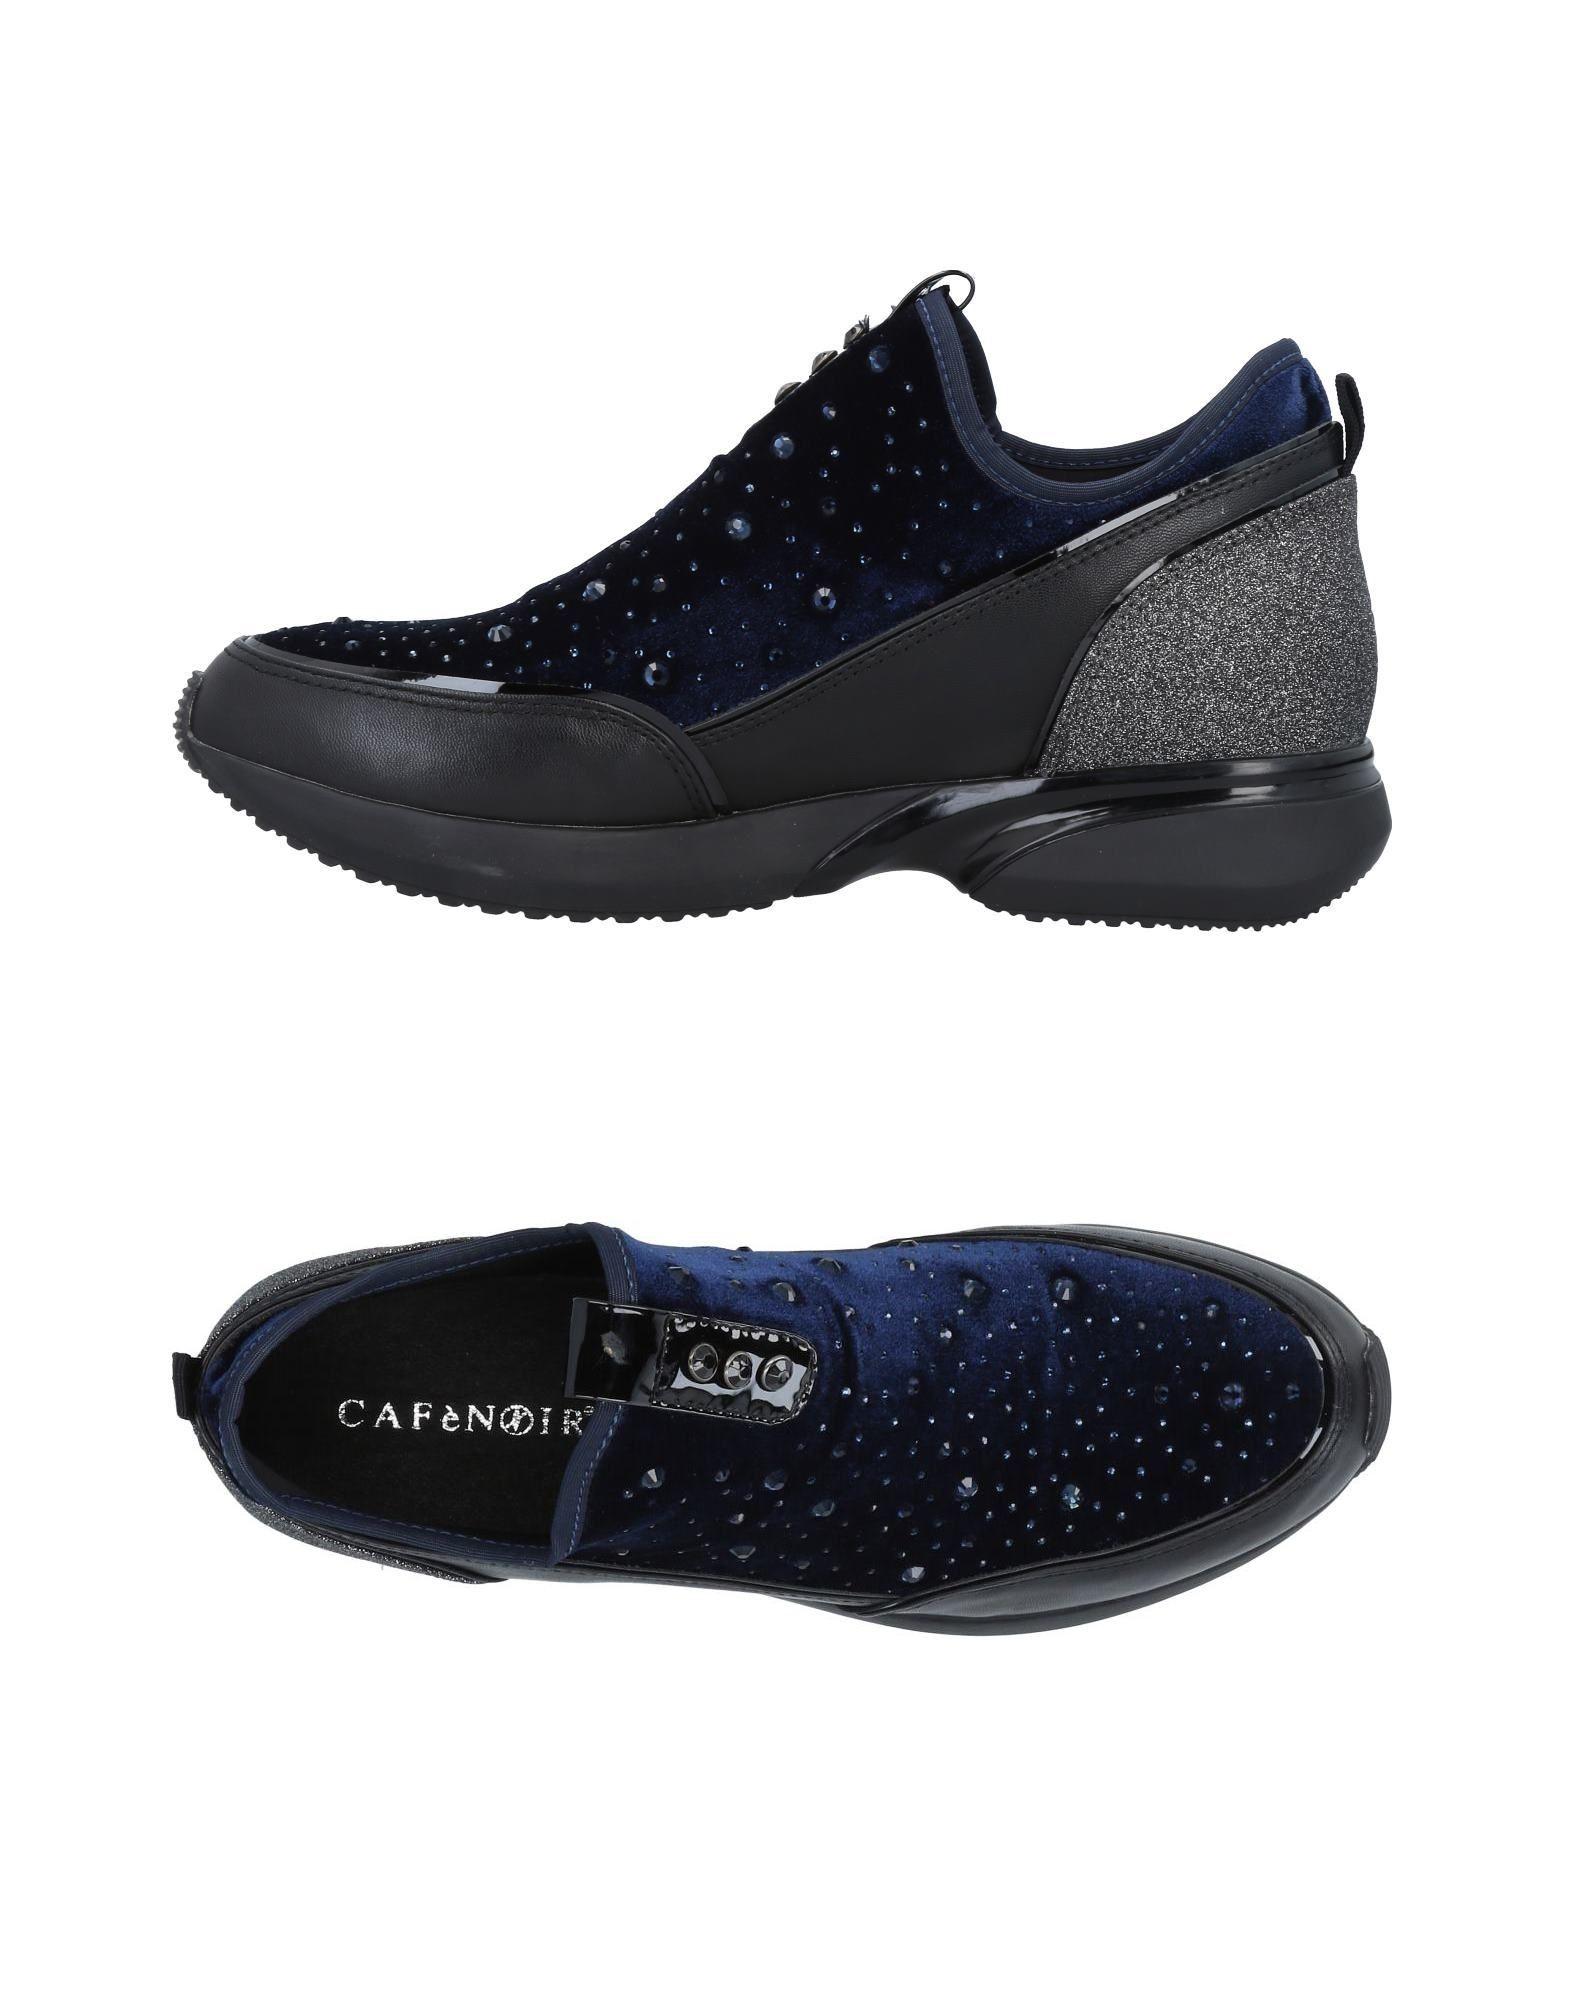 Zapatillas Cafènoir Mujer Negro - Zapatillas Cafènoir  Negro Mujer 714b25